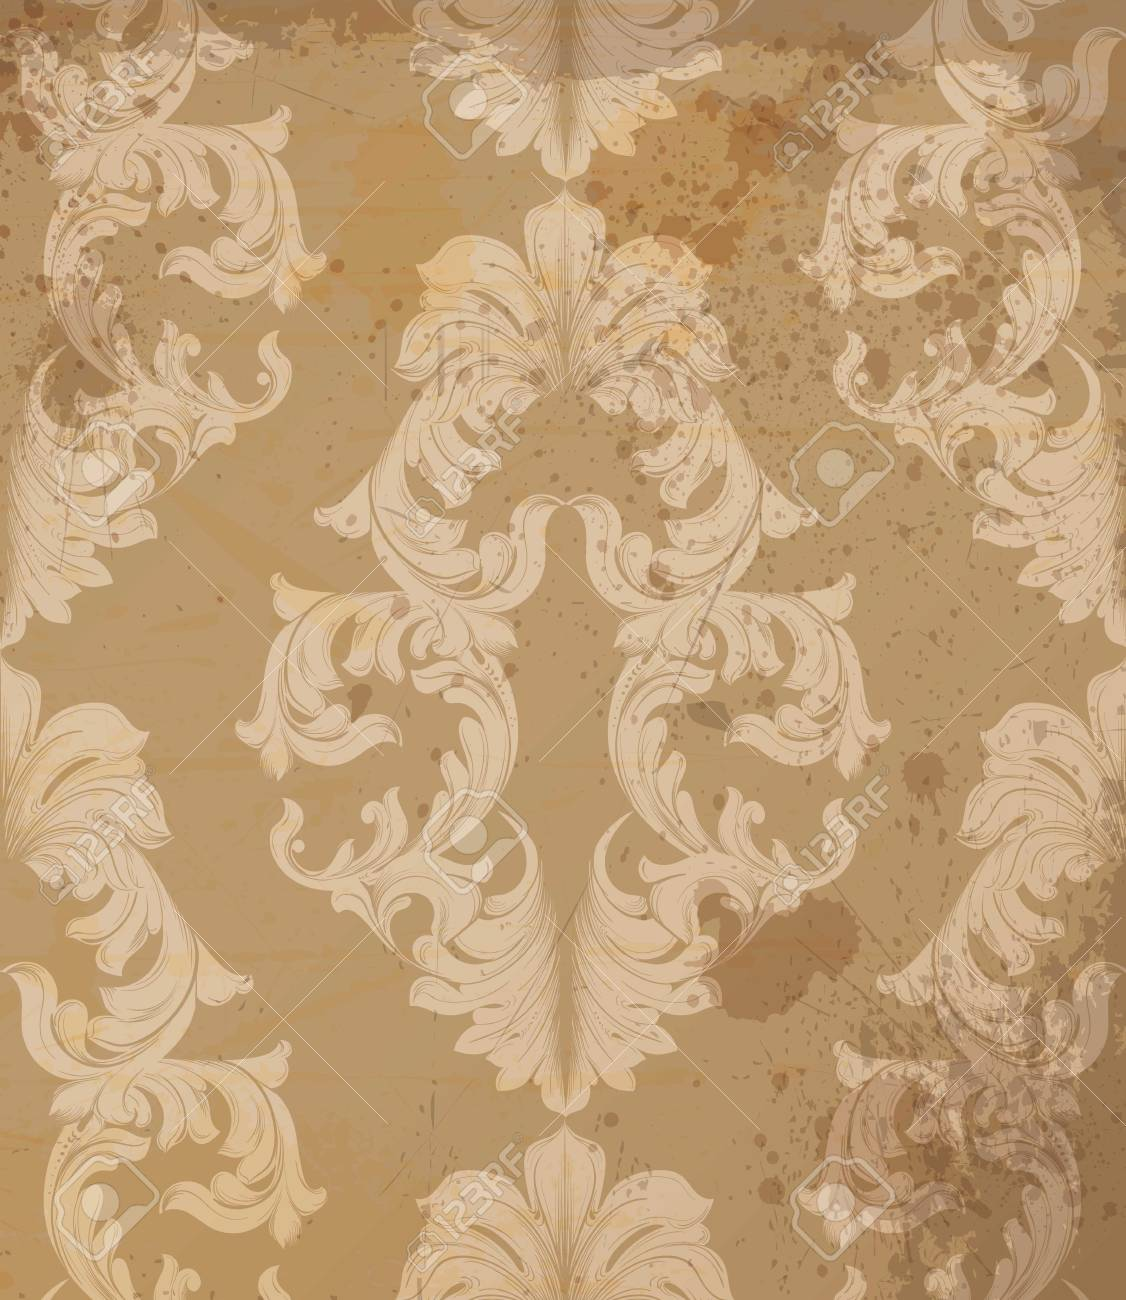 Amazing Baroque Wall Decor Frieze - The Wall Art Decorations ...